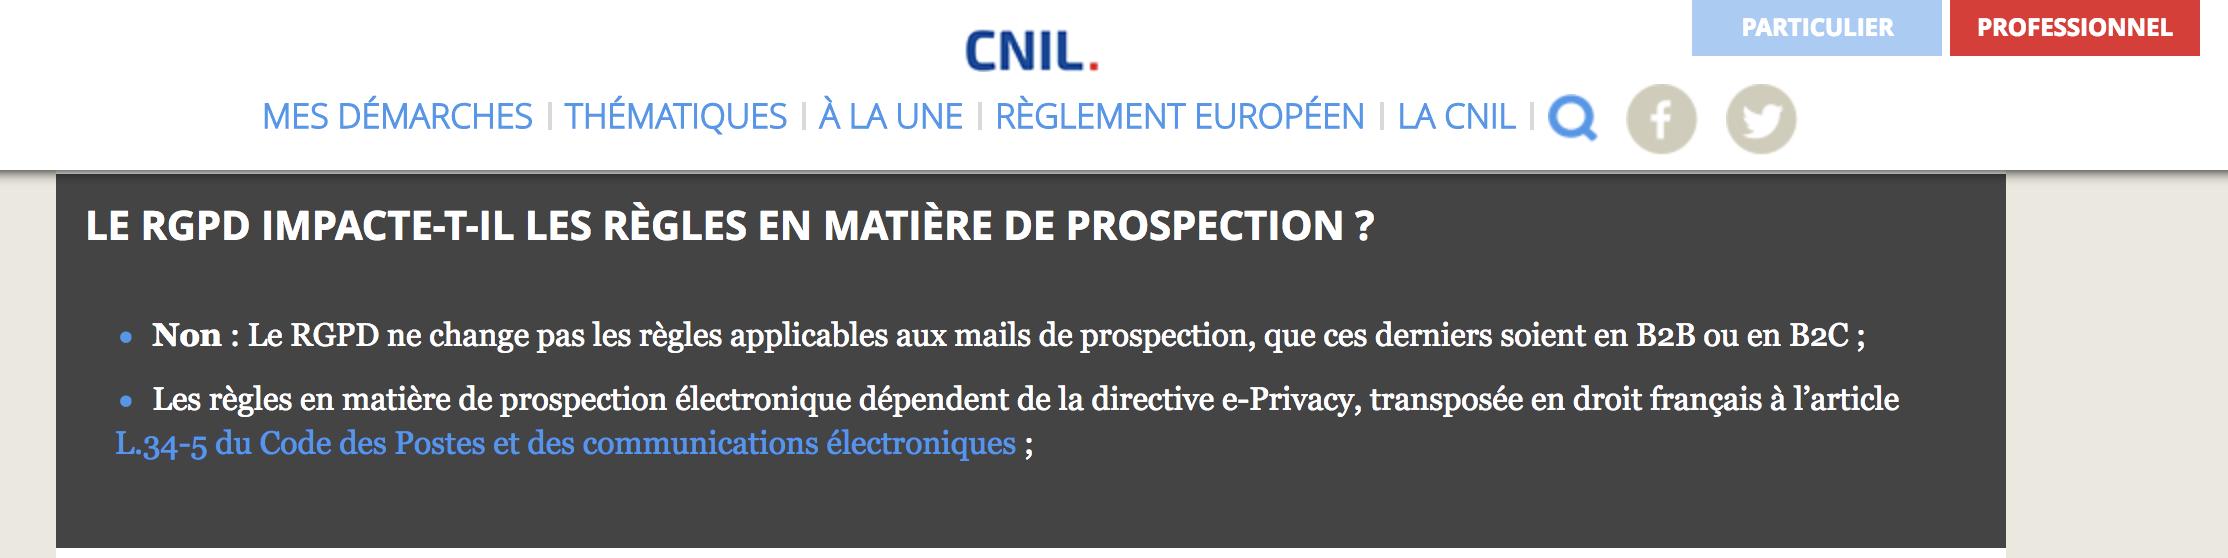 Landing Page de la CNIL